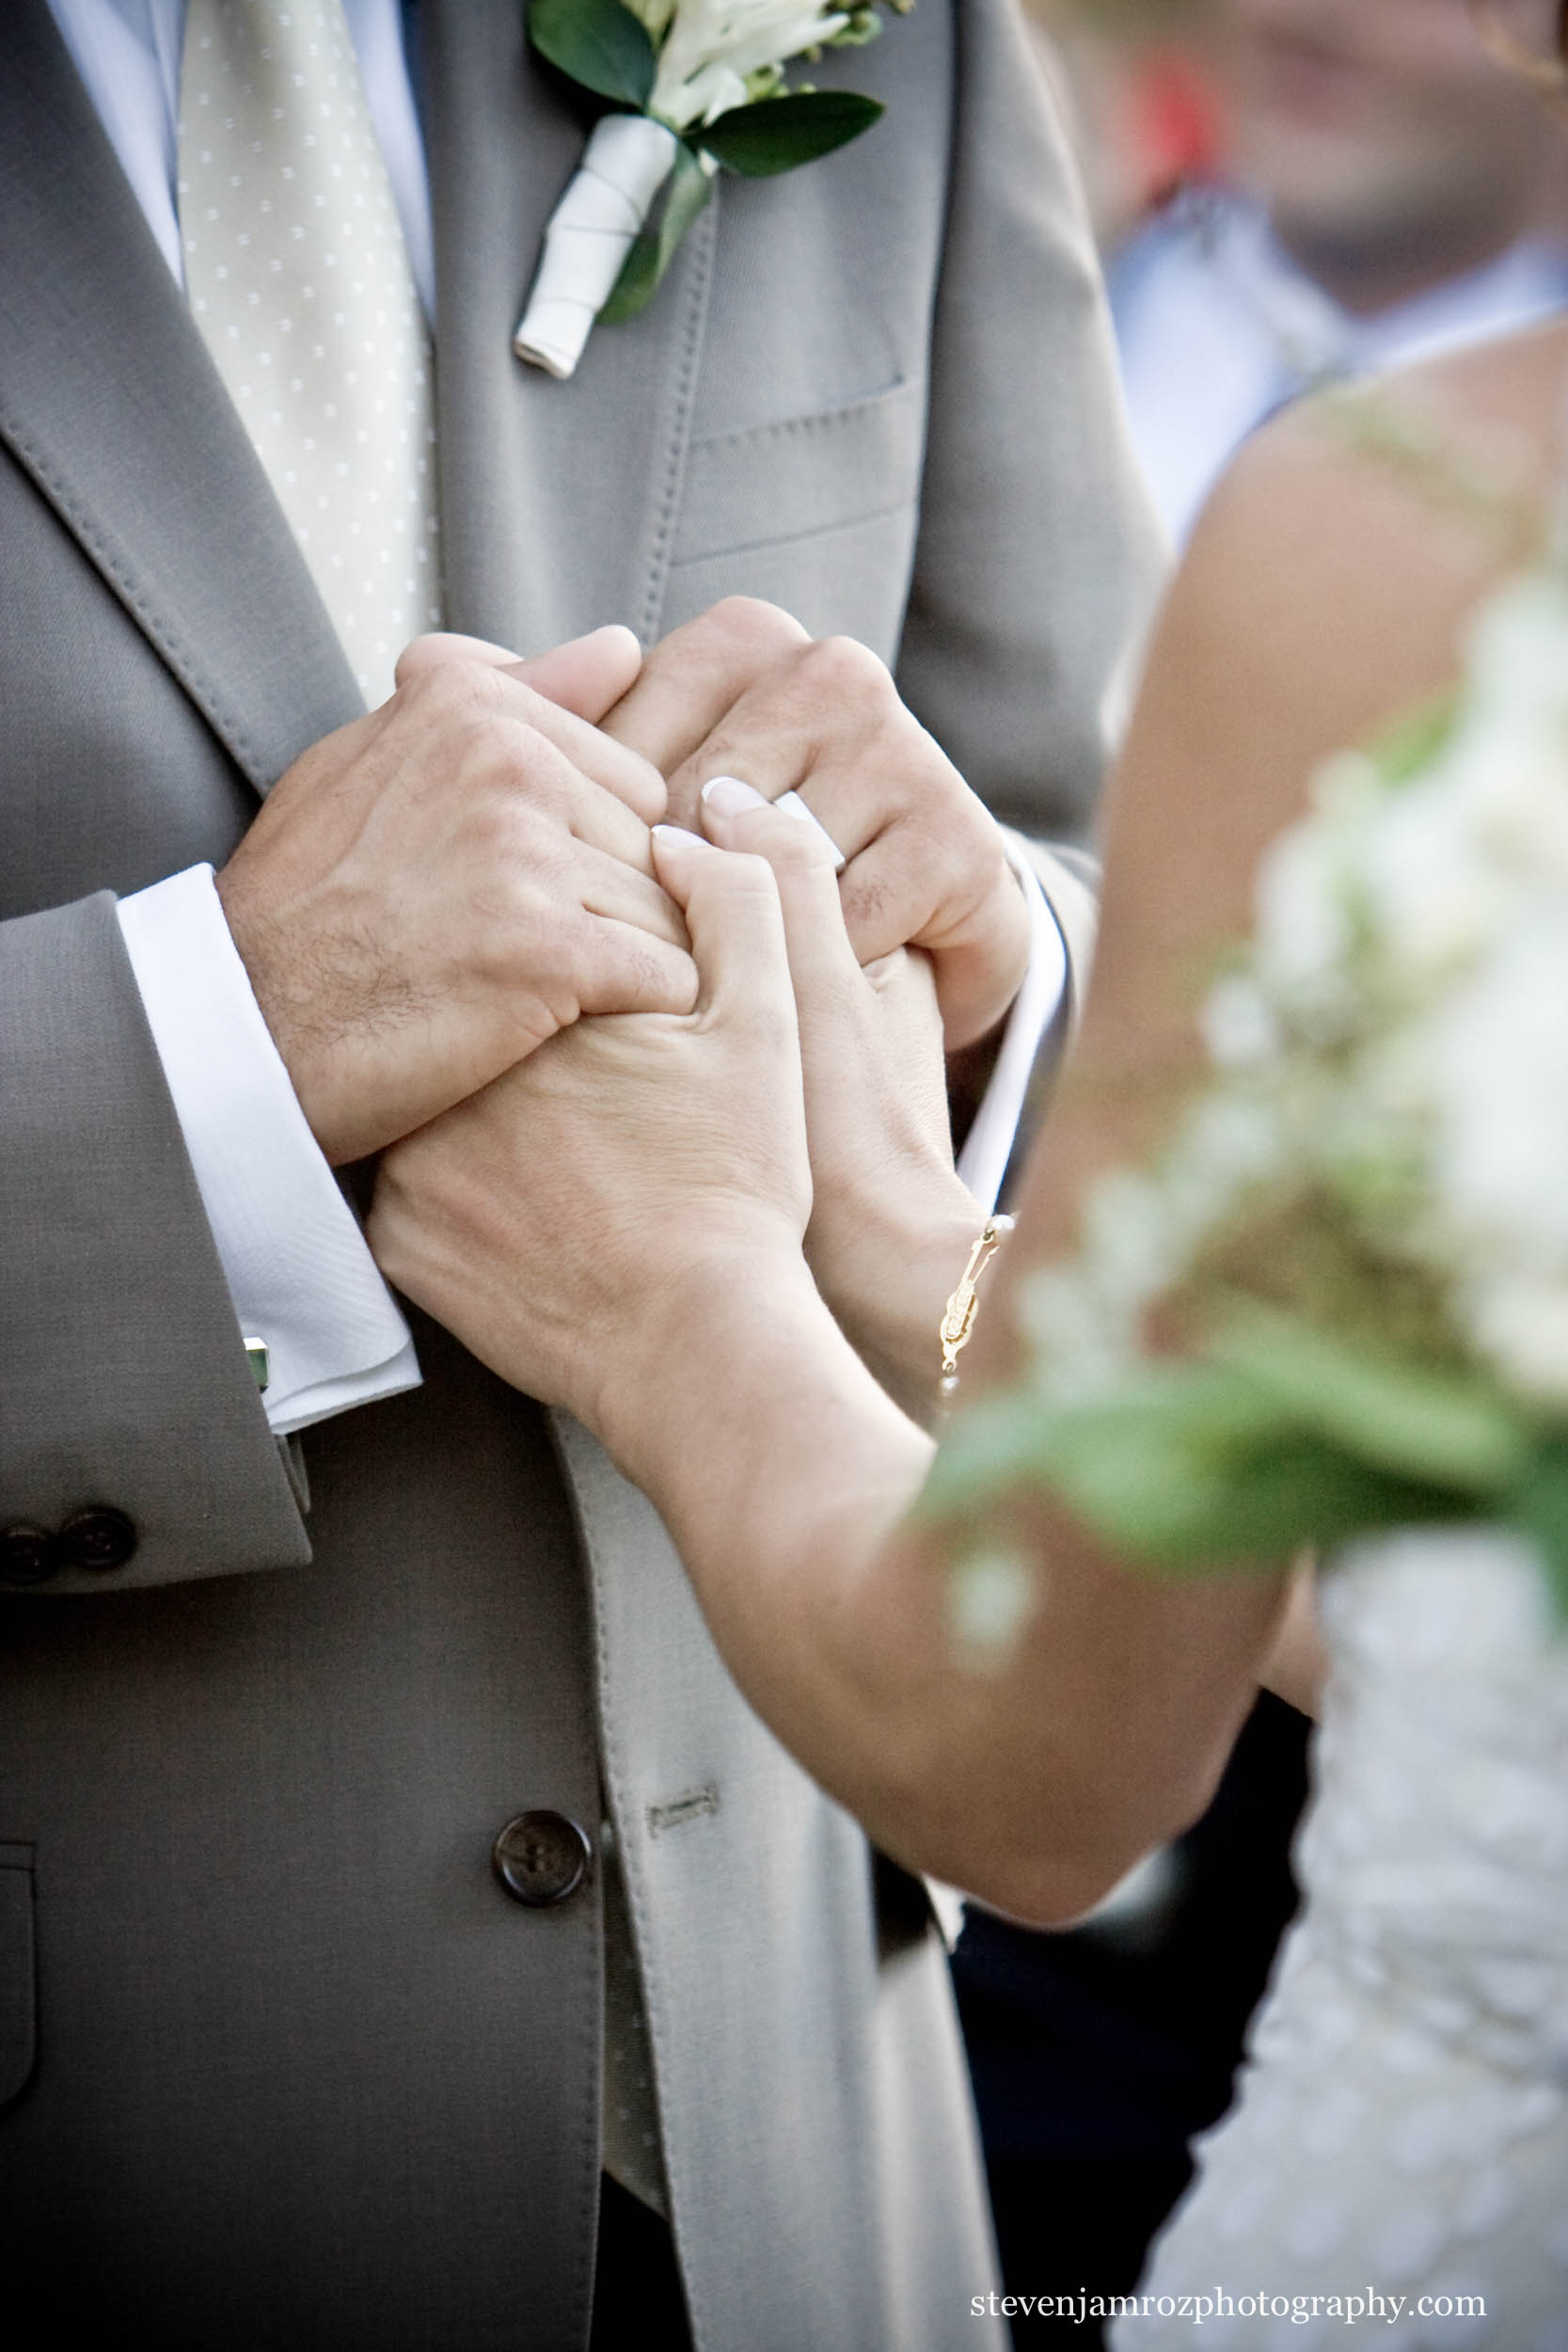 hold-hands-bride-groom-steven-jamroz-photography-0395.jpg